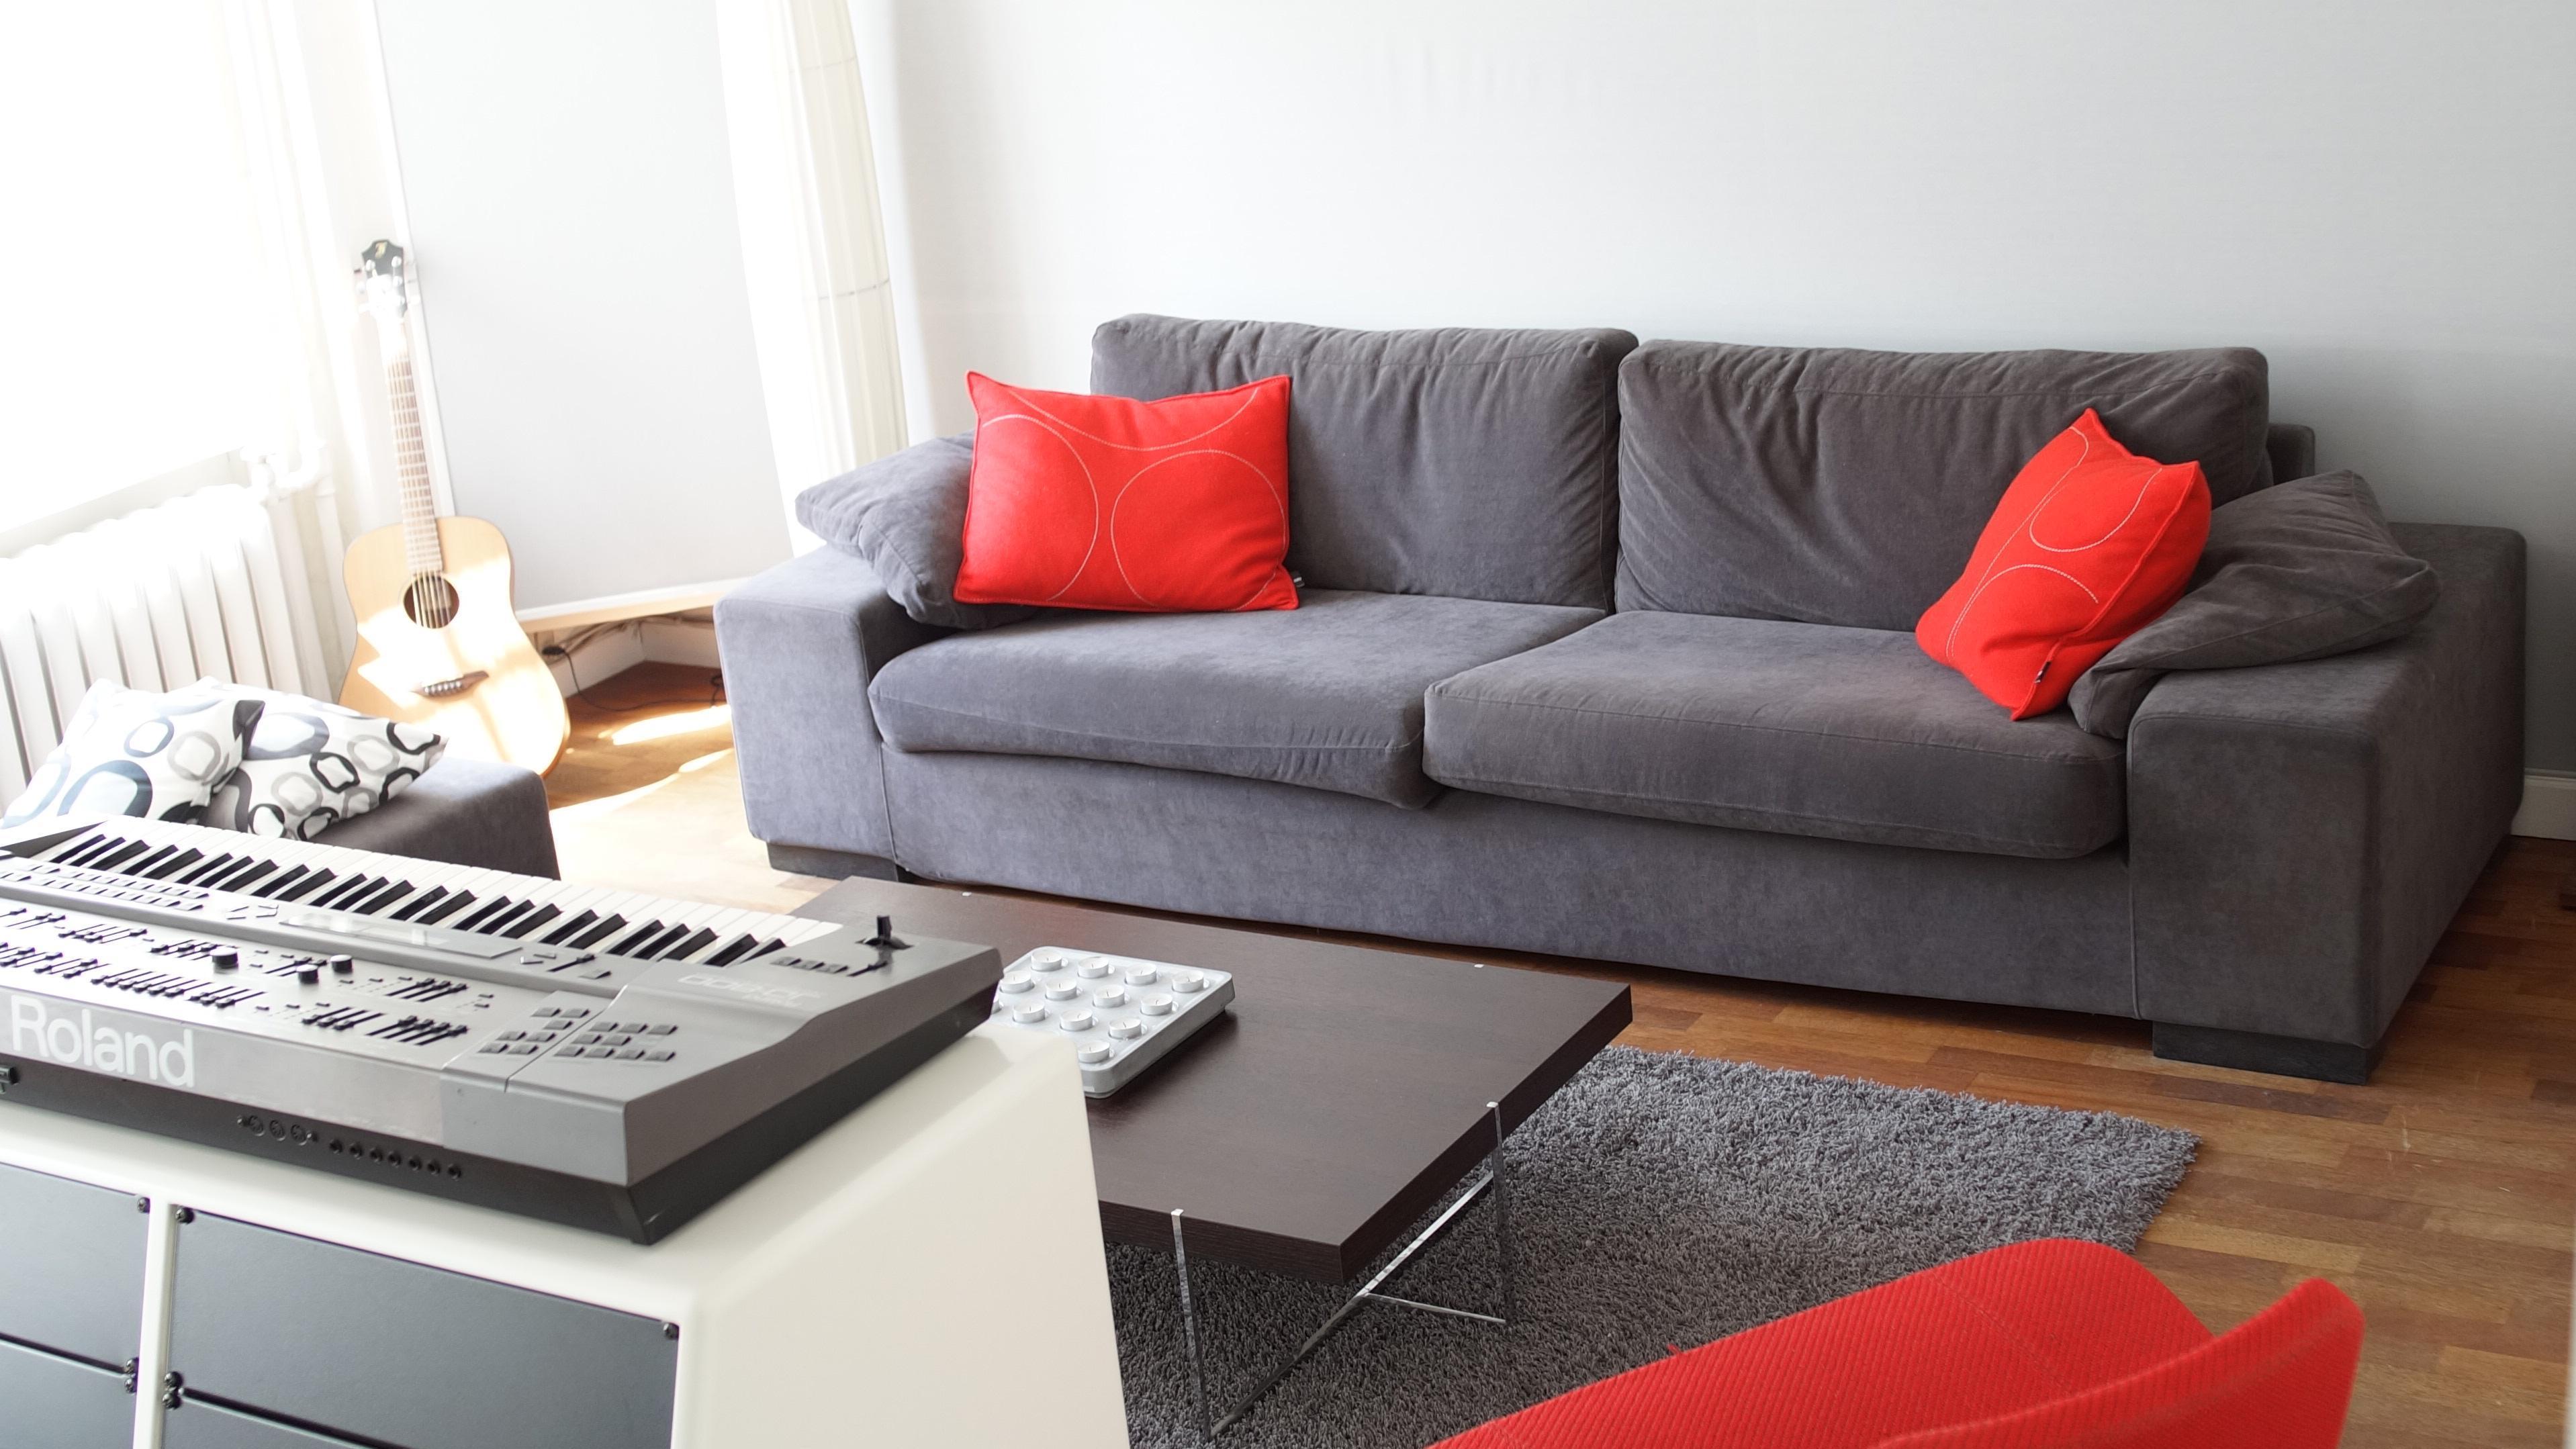 Eco friendly furniture protection for your home zerorez for Zerorez hardwood floors